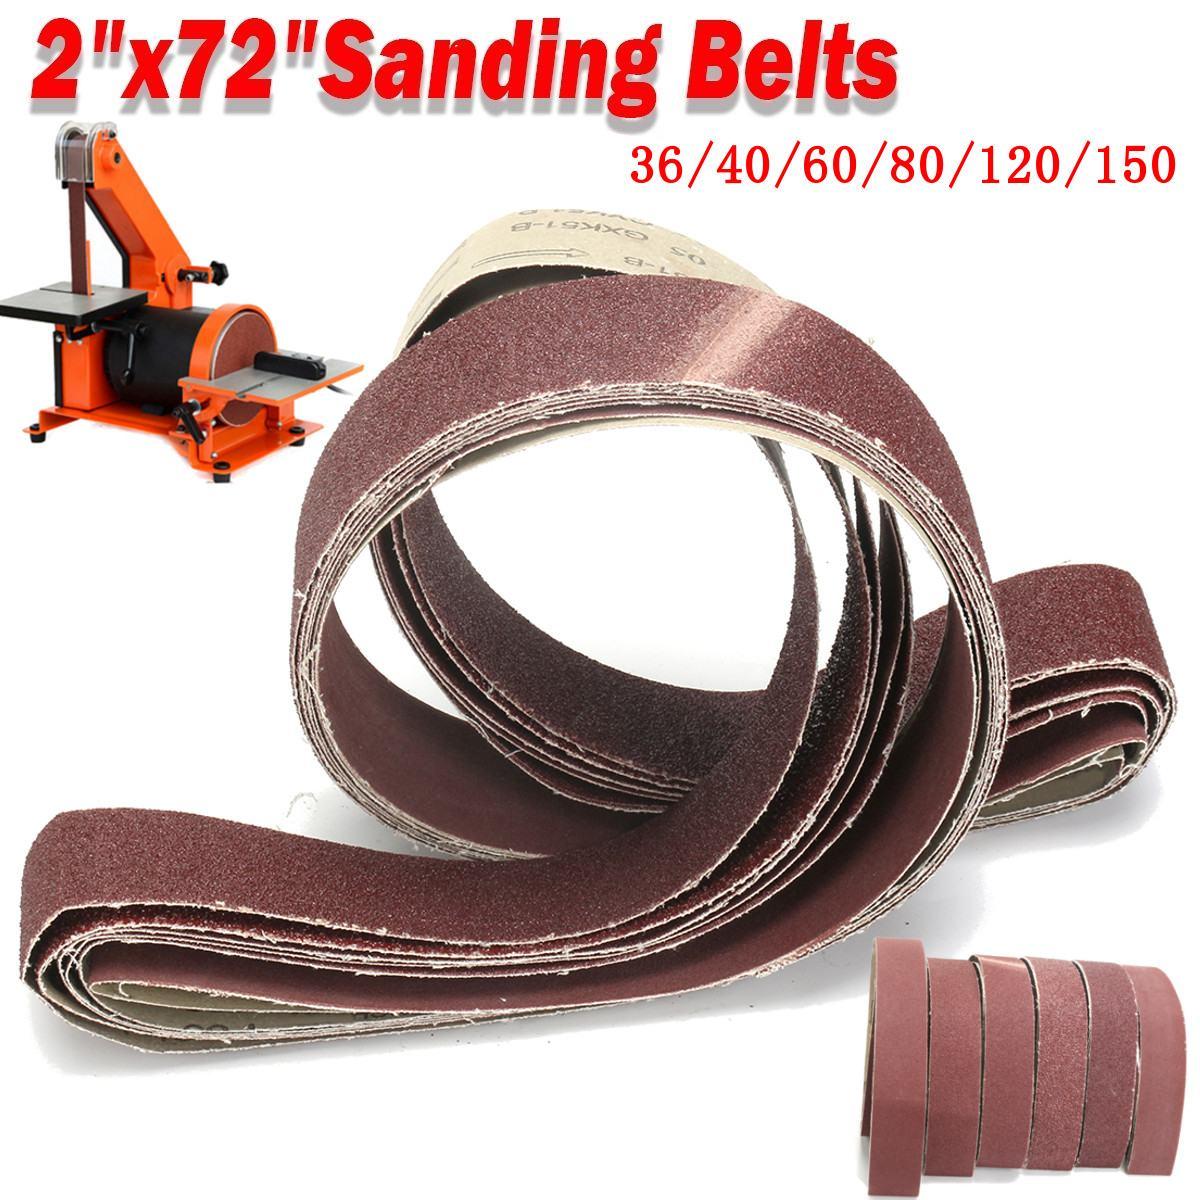 6pcs 50x1820mm A/O Abrasive Mixed Grit Sanding Belts Set 2